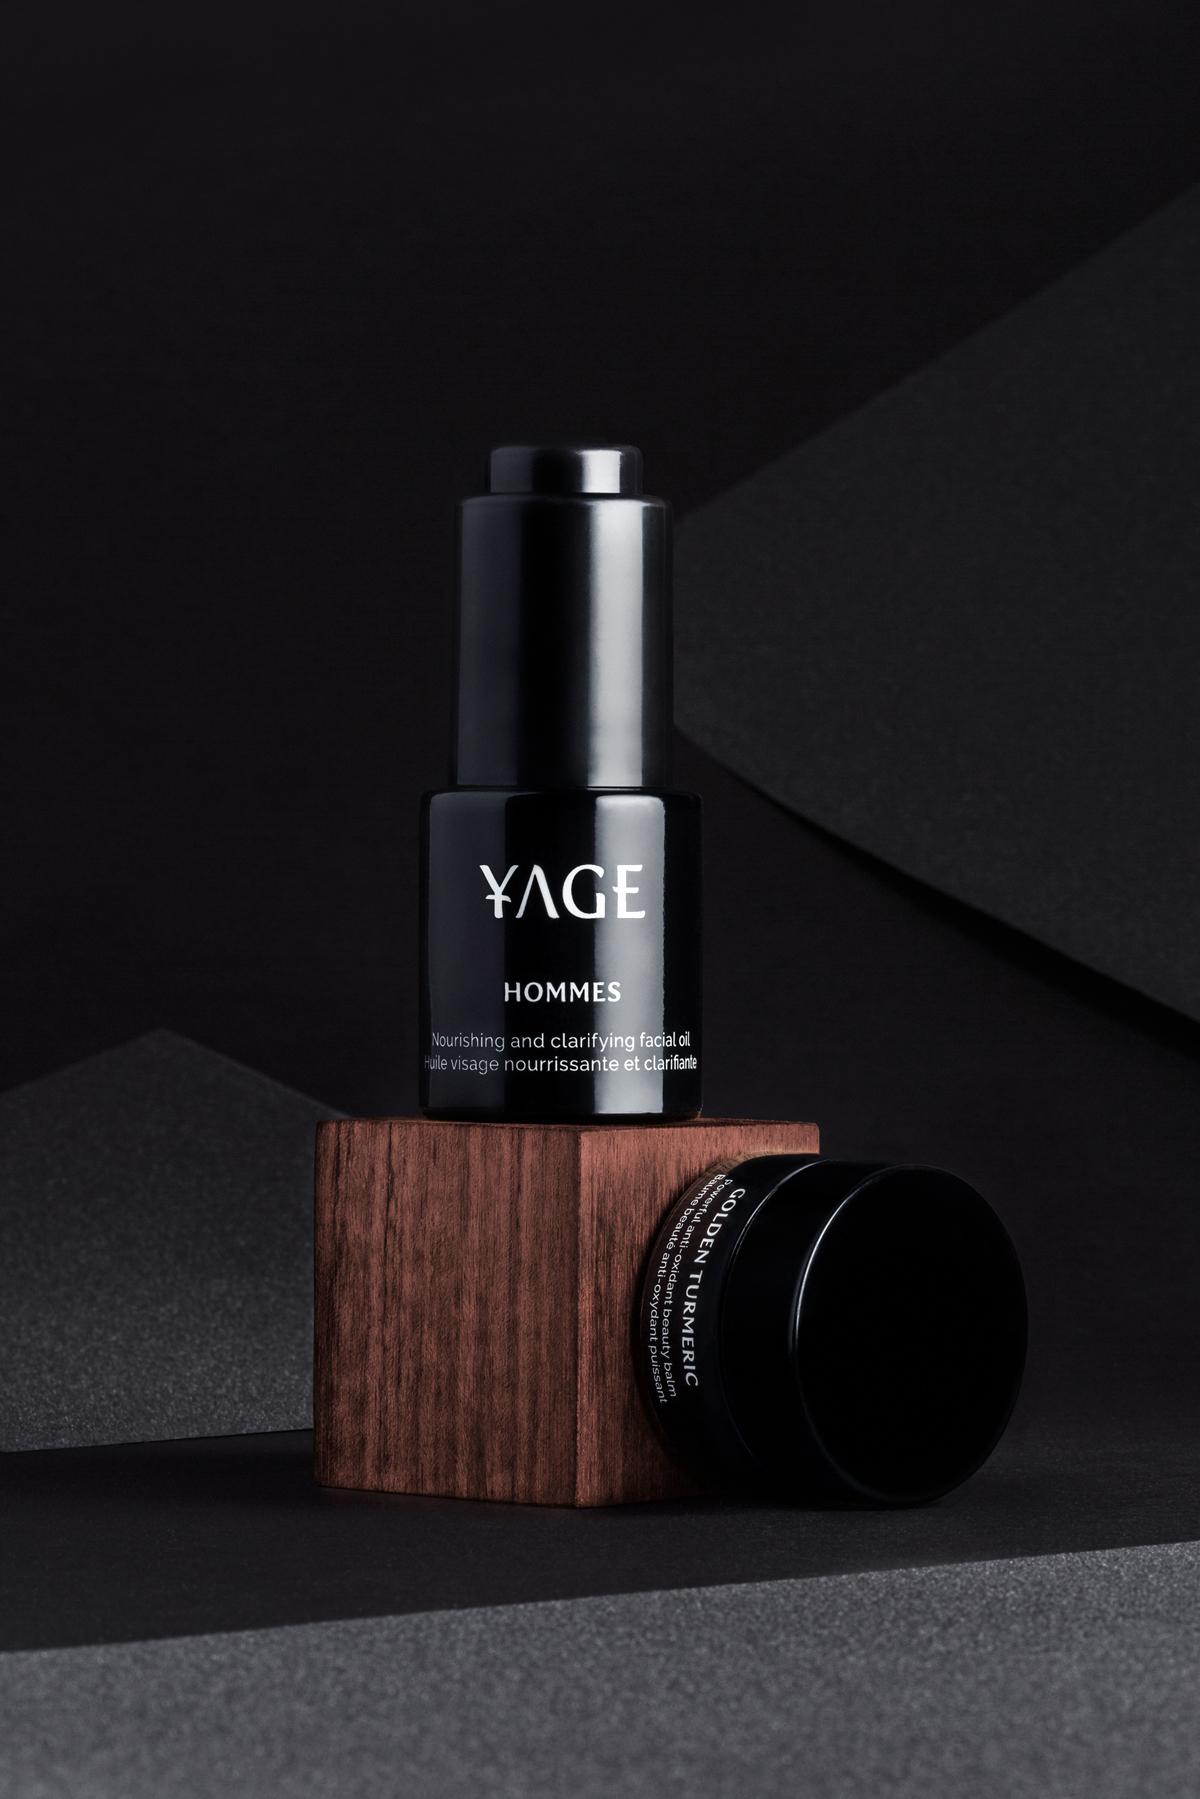 YAGE cosmetics